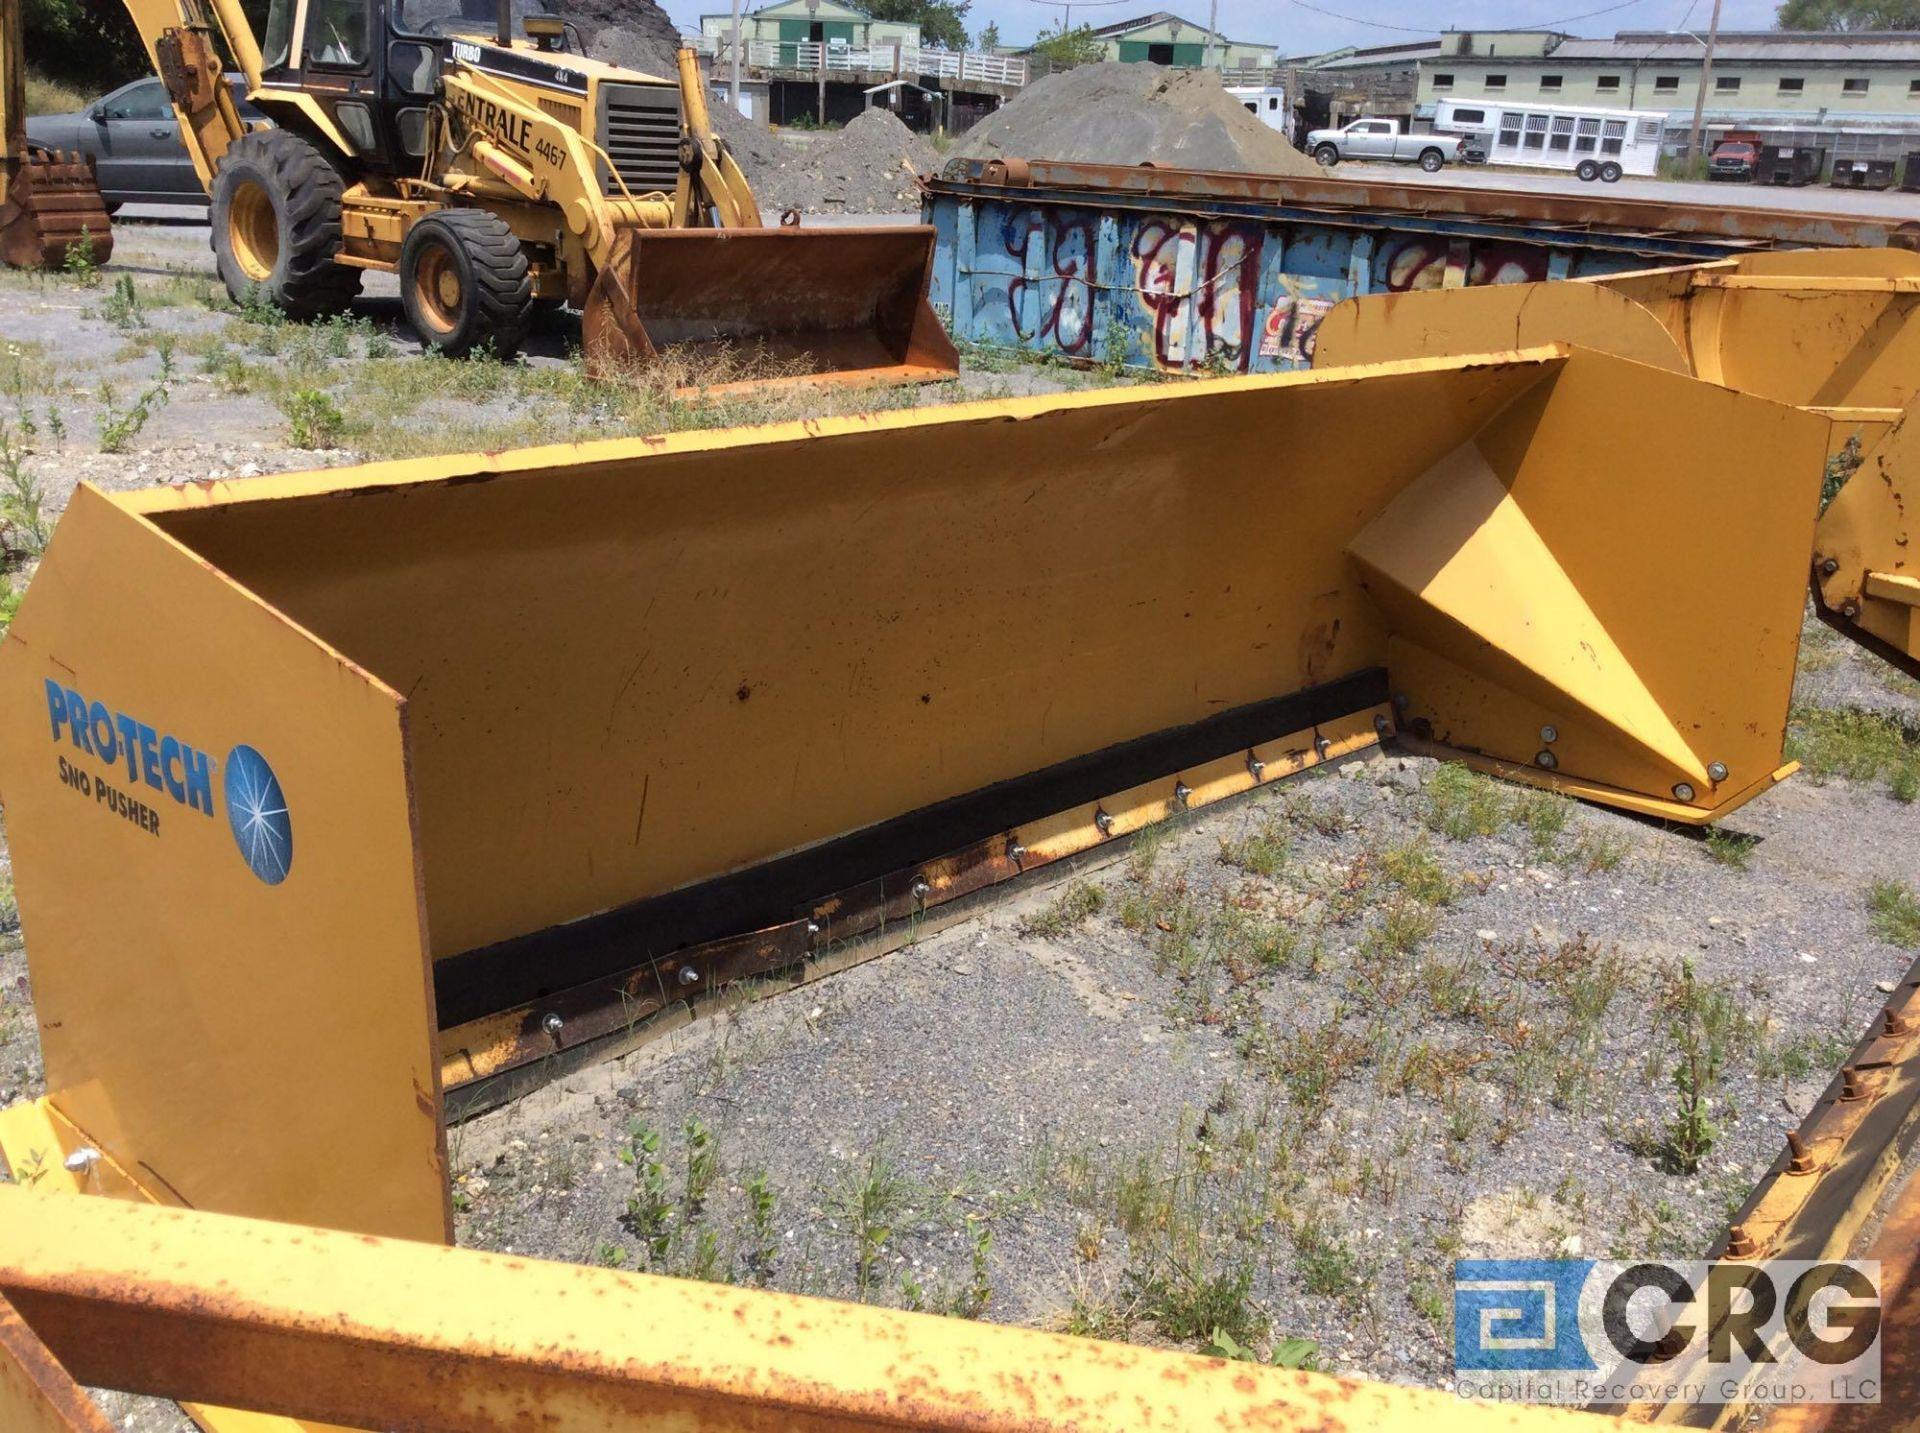 Lot 499 - Pro-Tec SP-12B 12 footsnow pusher for full sizeloader backhoe